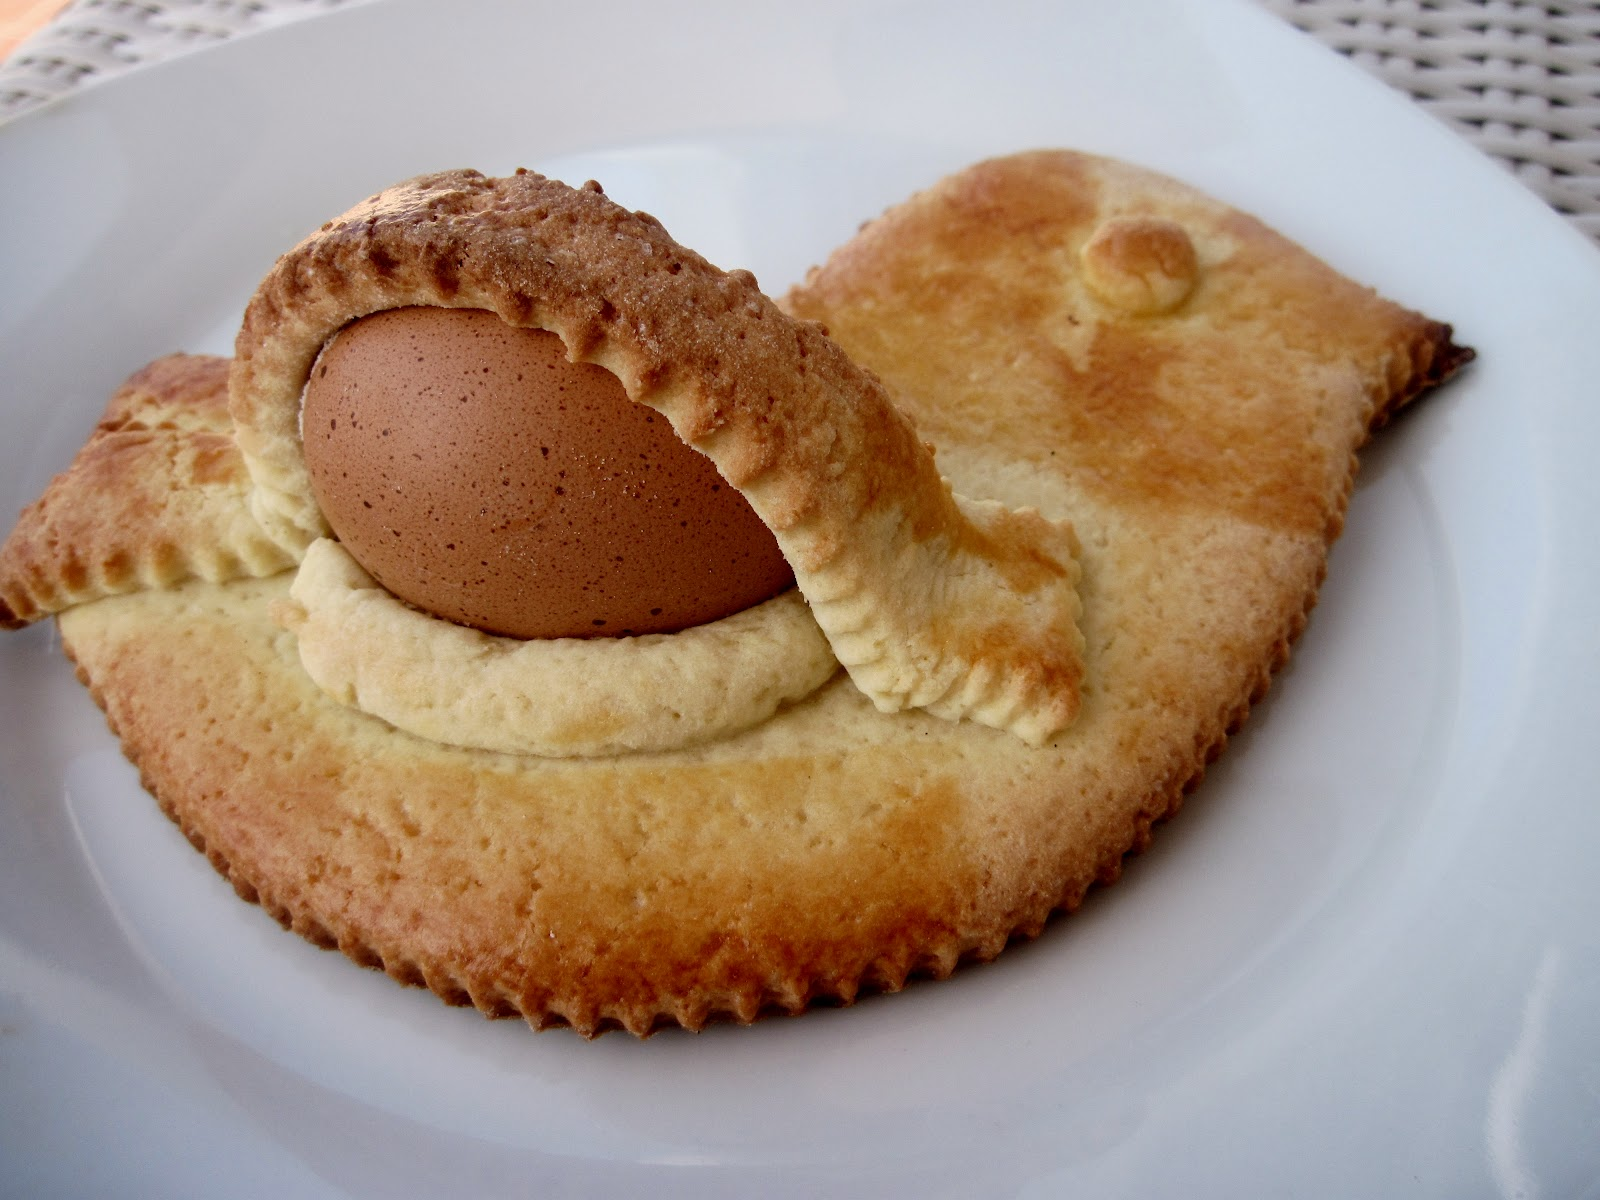 bizcocho semana santa sicilia aceddu cu l'ovu